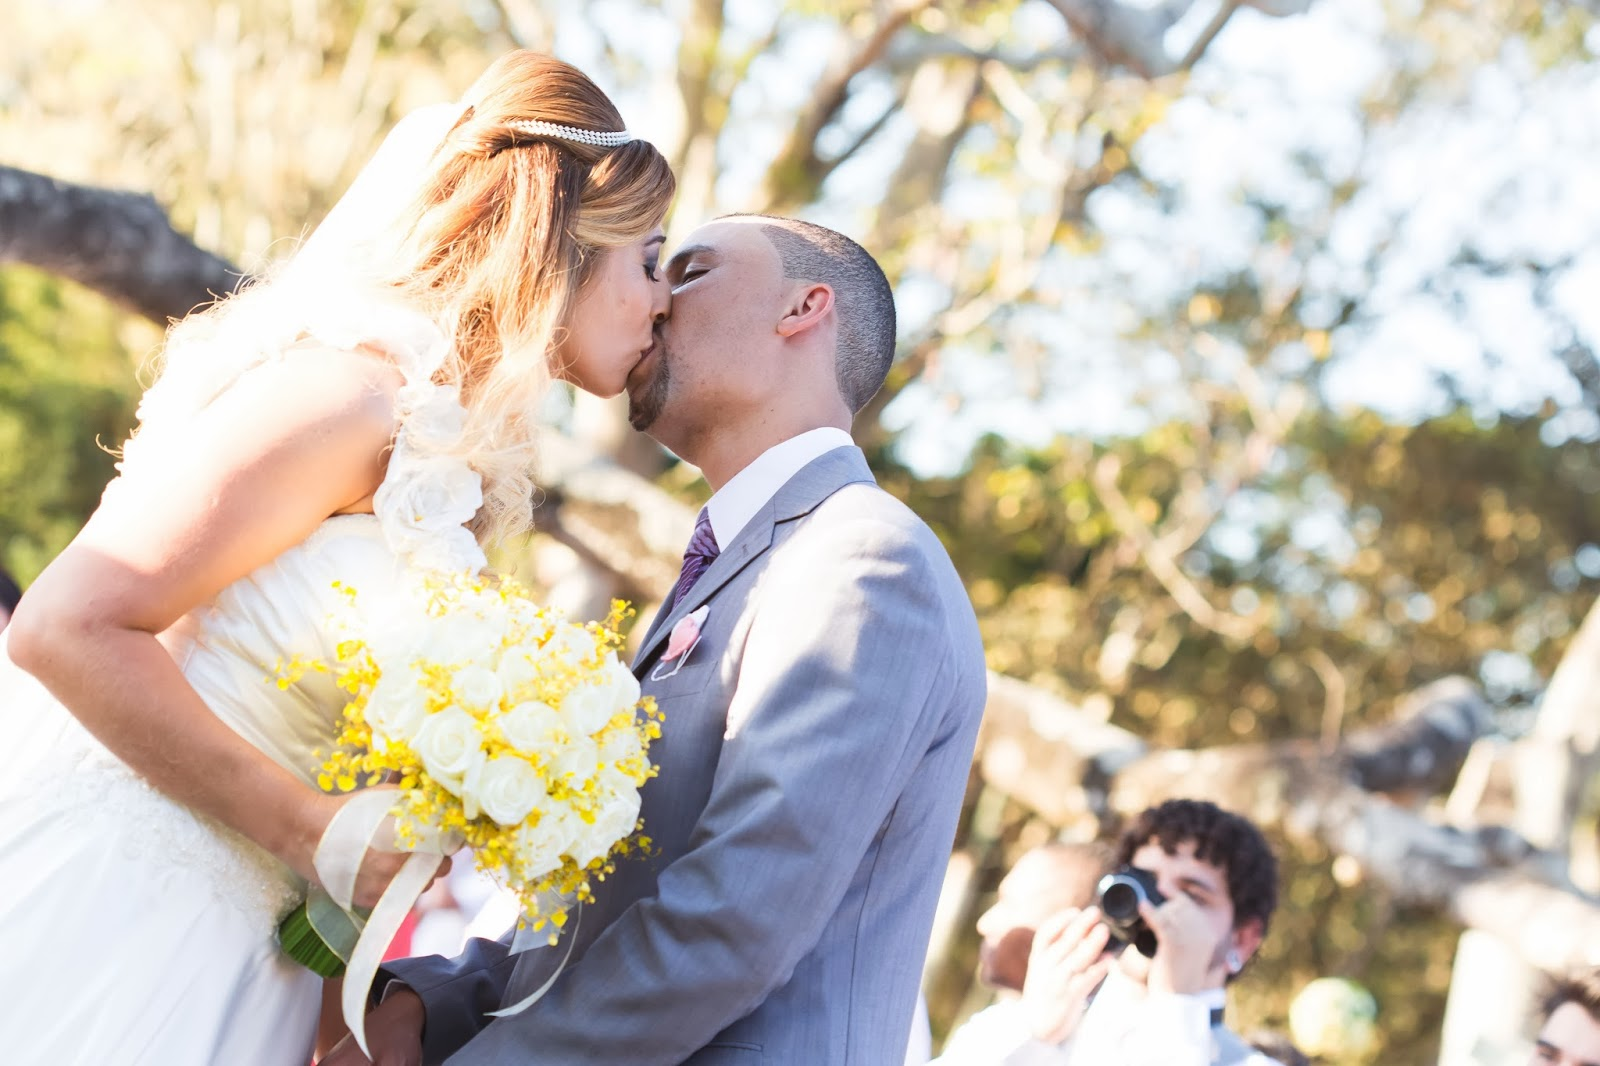 noivos - primeiro beijo - casamento de dia - casamento ao ar livre